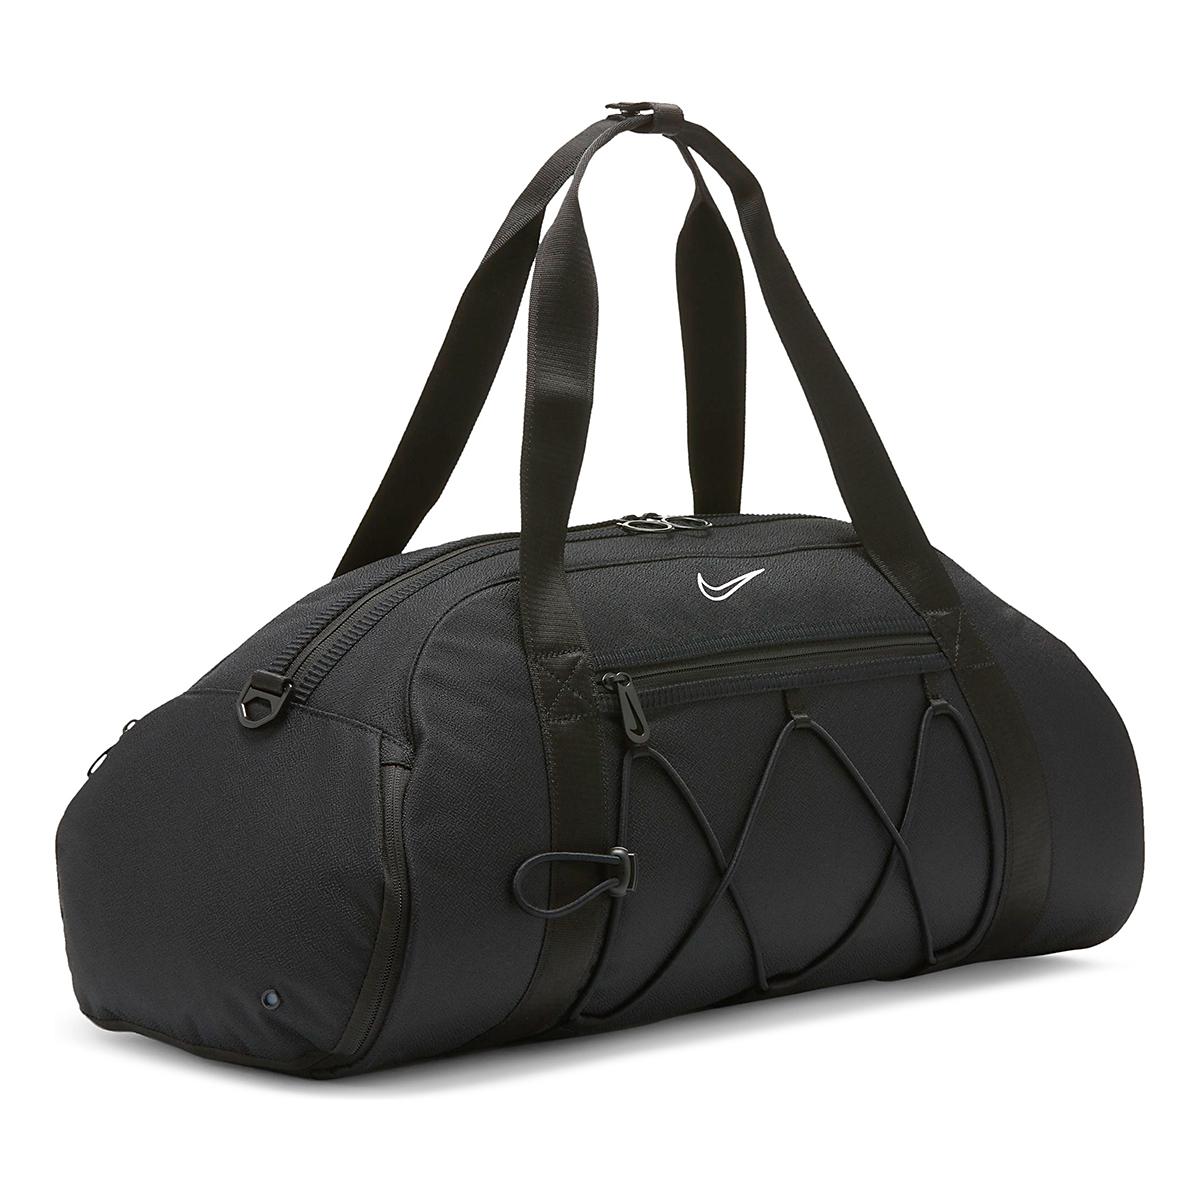 Women's Nike One Club Duffel Bag - Color: Black, Black, large, image 3